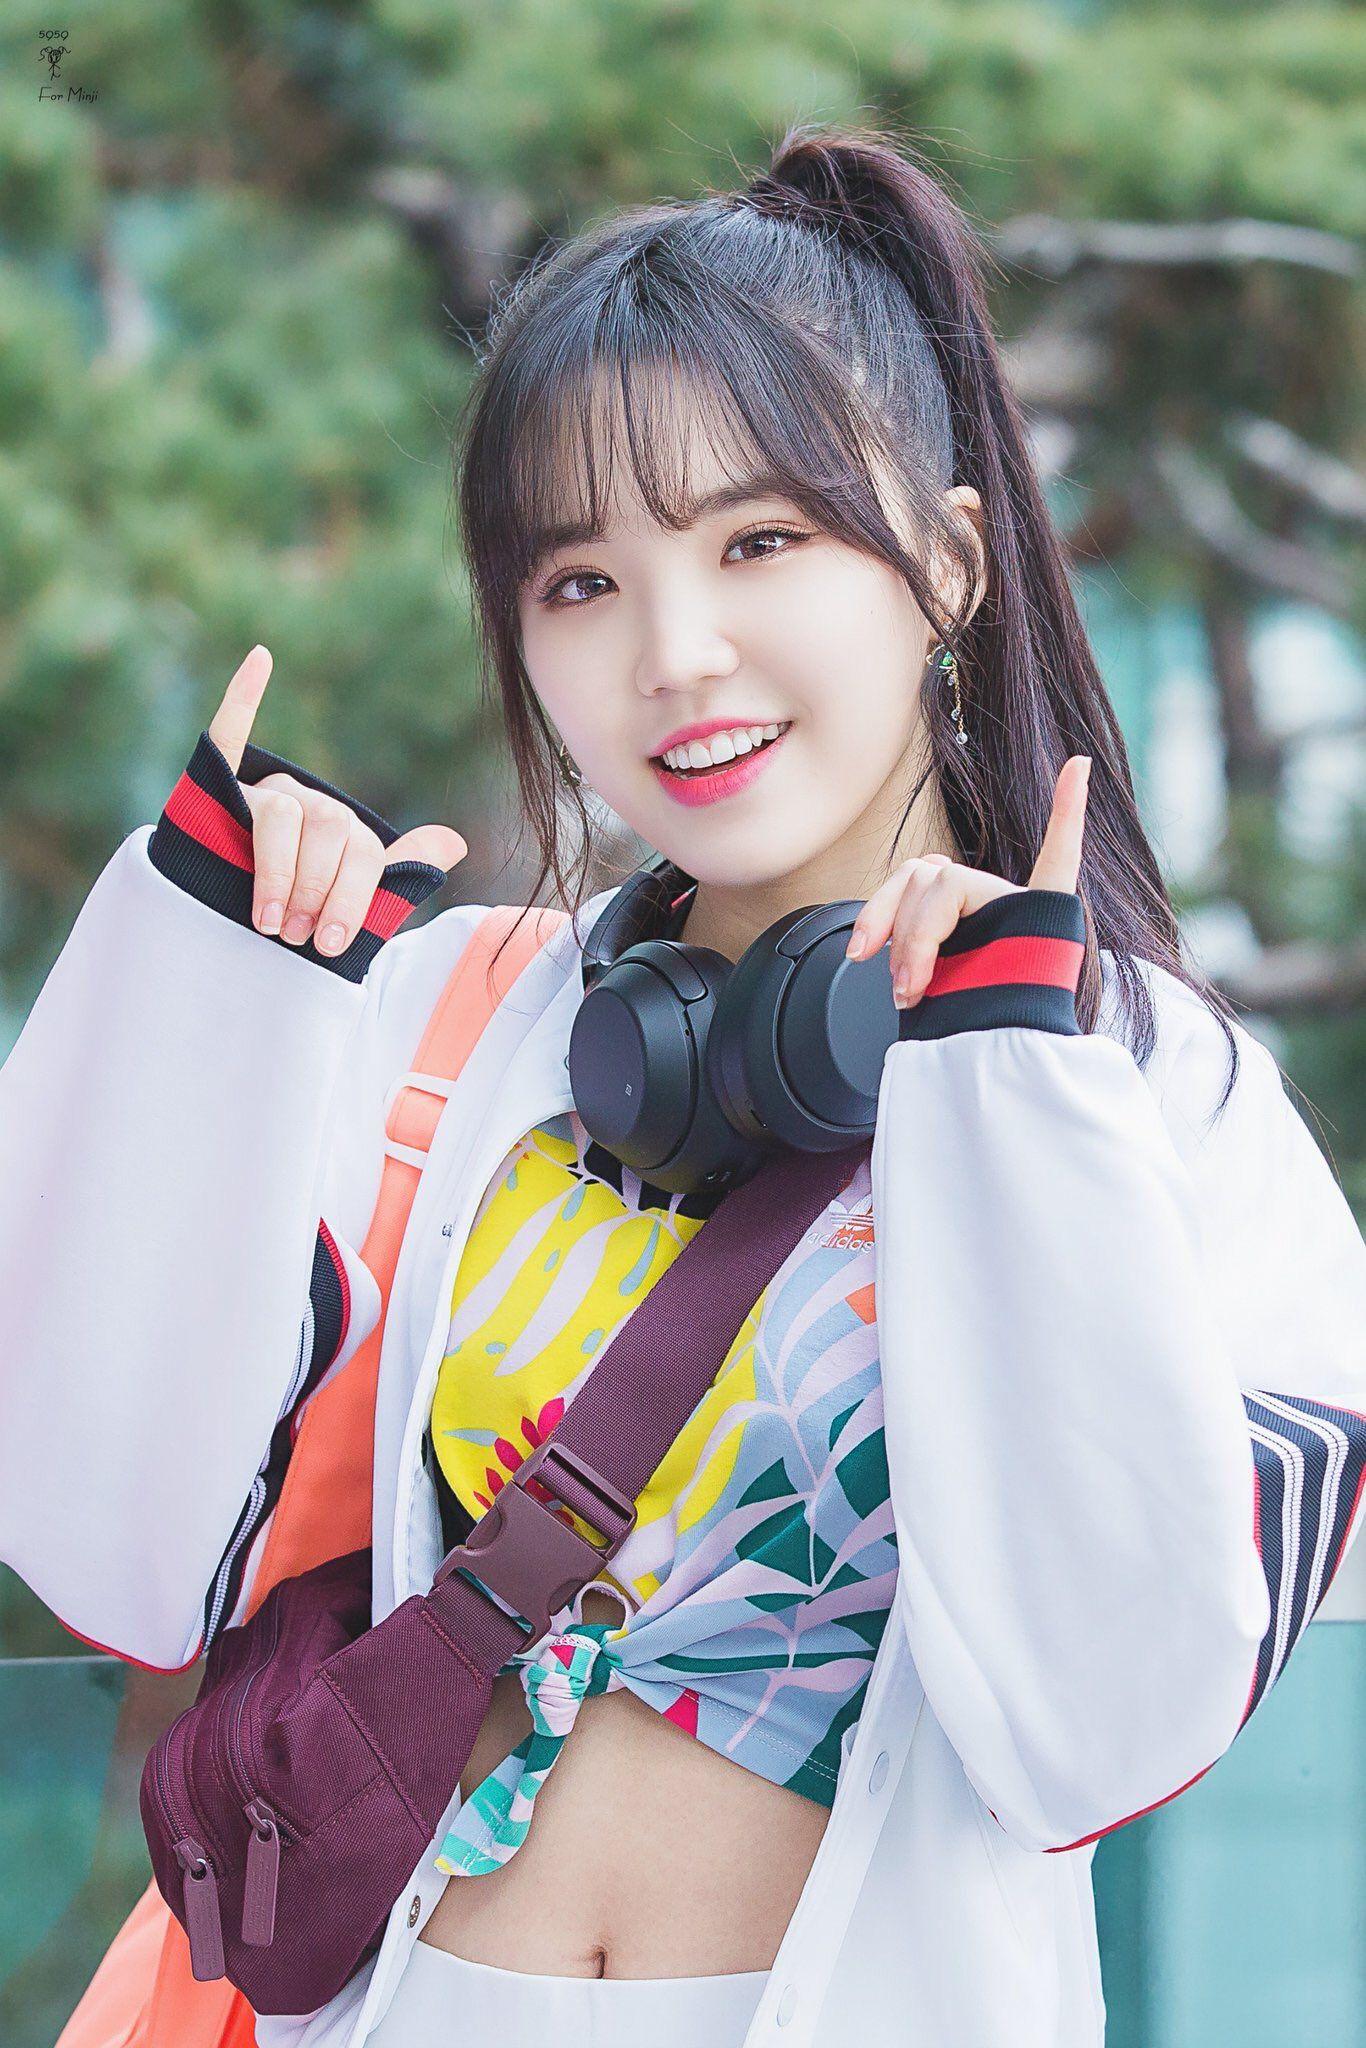 Minji Kpop Kdrama Bts Exo Kpoparmy Kpop Girls Kim Min Ji Korean Idol